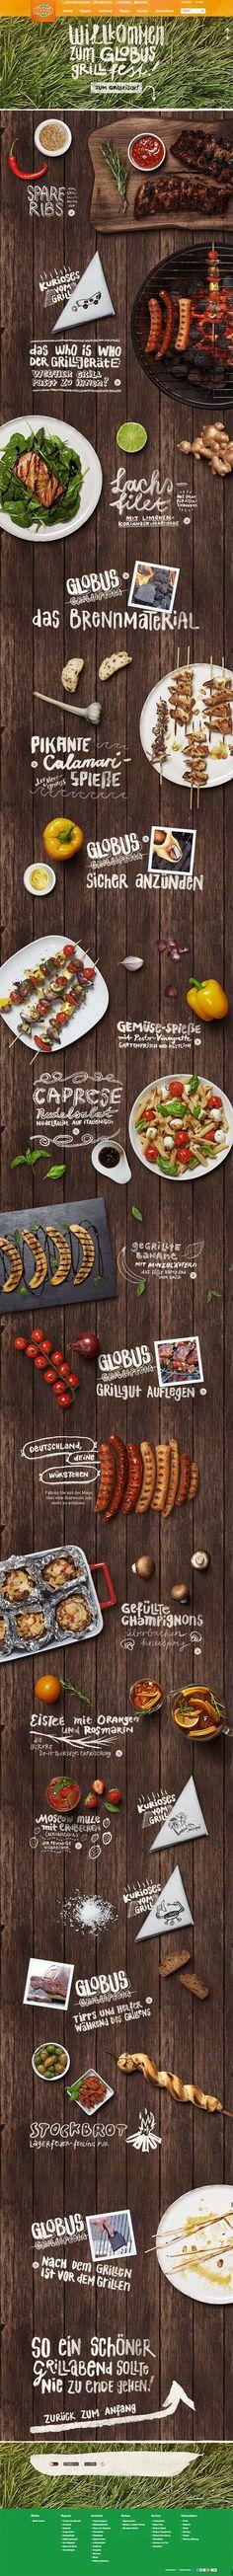 The Globus Grillfest by Kathrin Schmitz, via Behance Tendances Iscomigoo Webdesign http://iscomigoo-webdesign.blogspot.fr/: